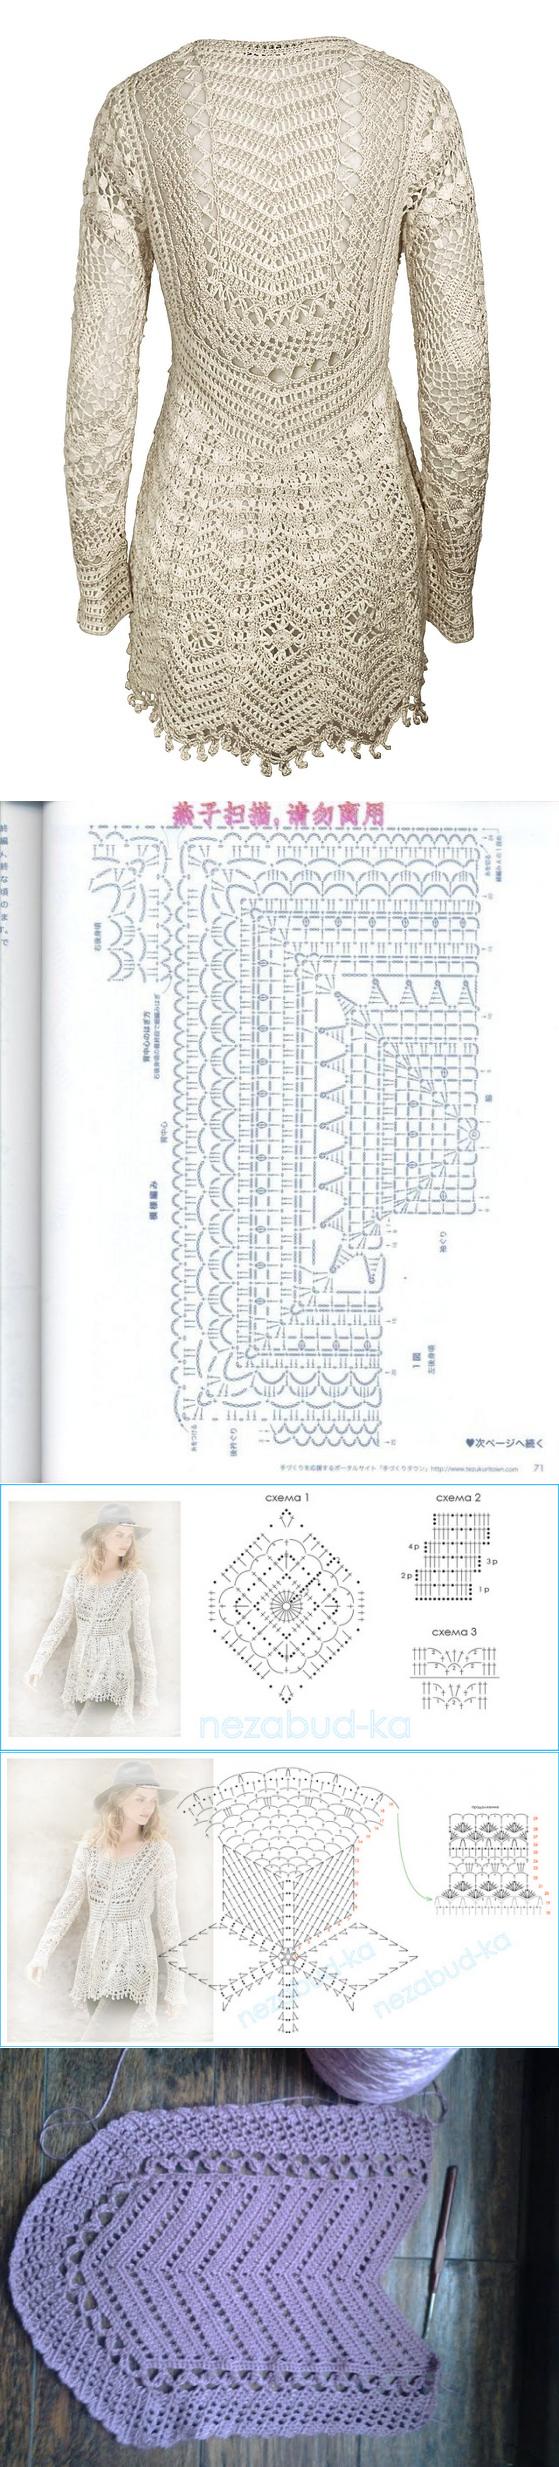 Ergahandmade crochet cardigan diagrams 3 pinterest ergahandmade crochet cardigan diagrams ccuart Image collections